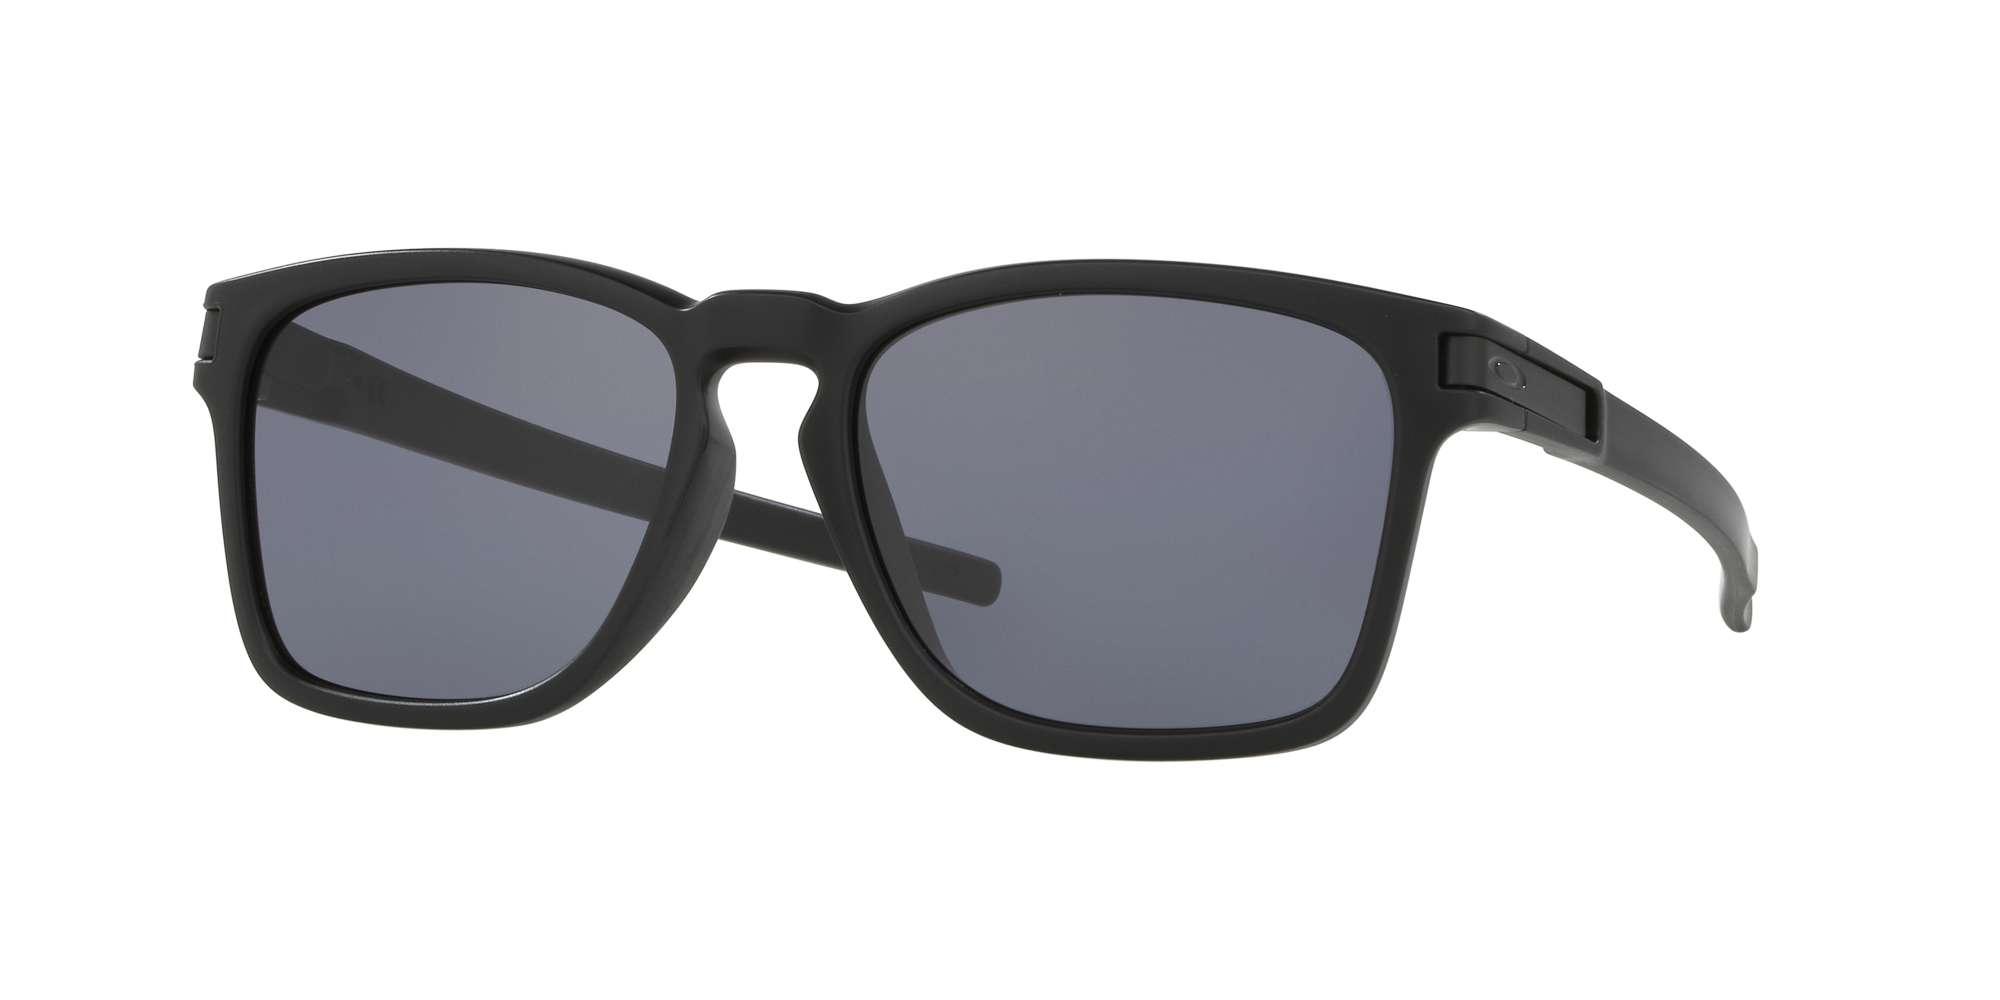 MATTE BLACK / GREY lenses